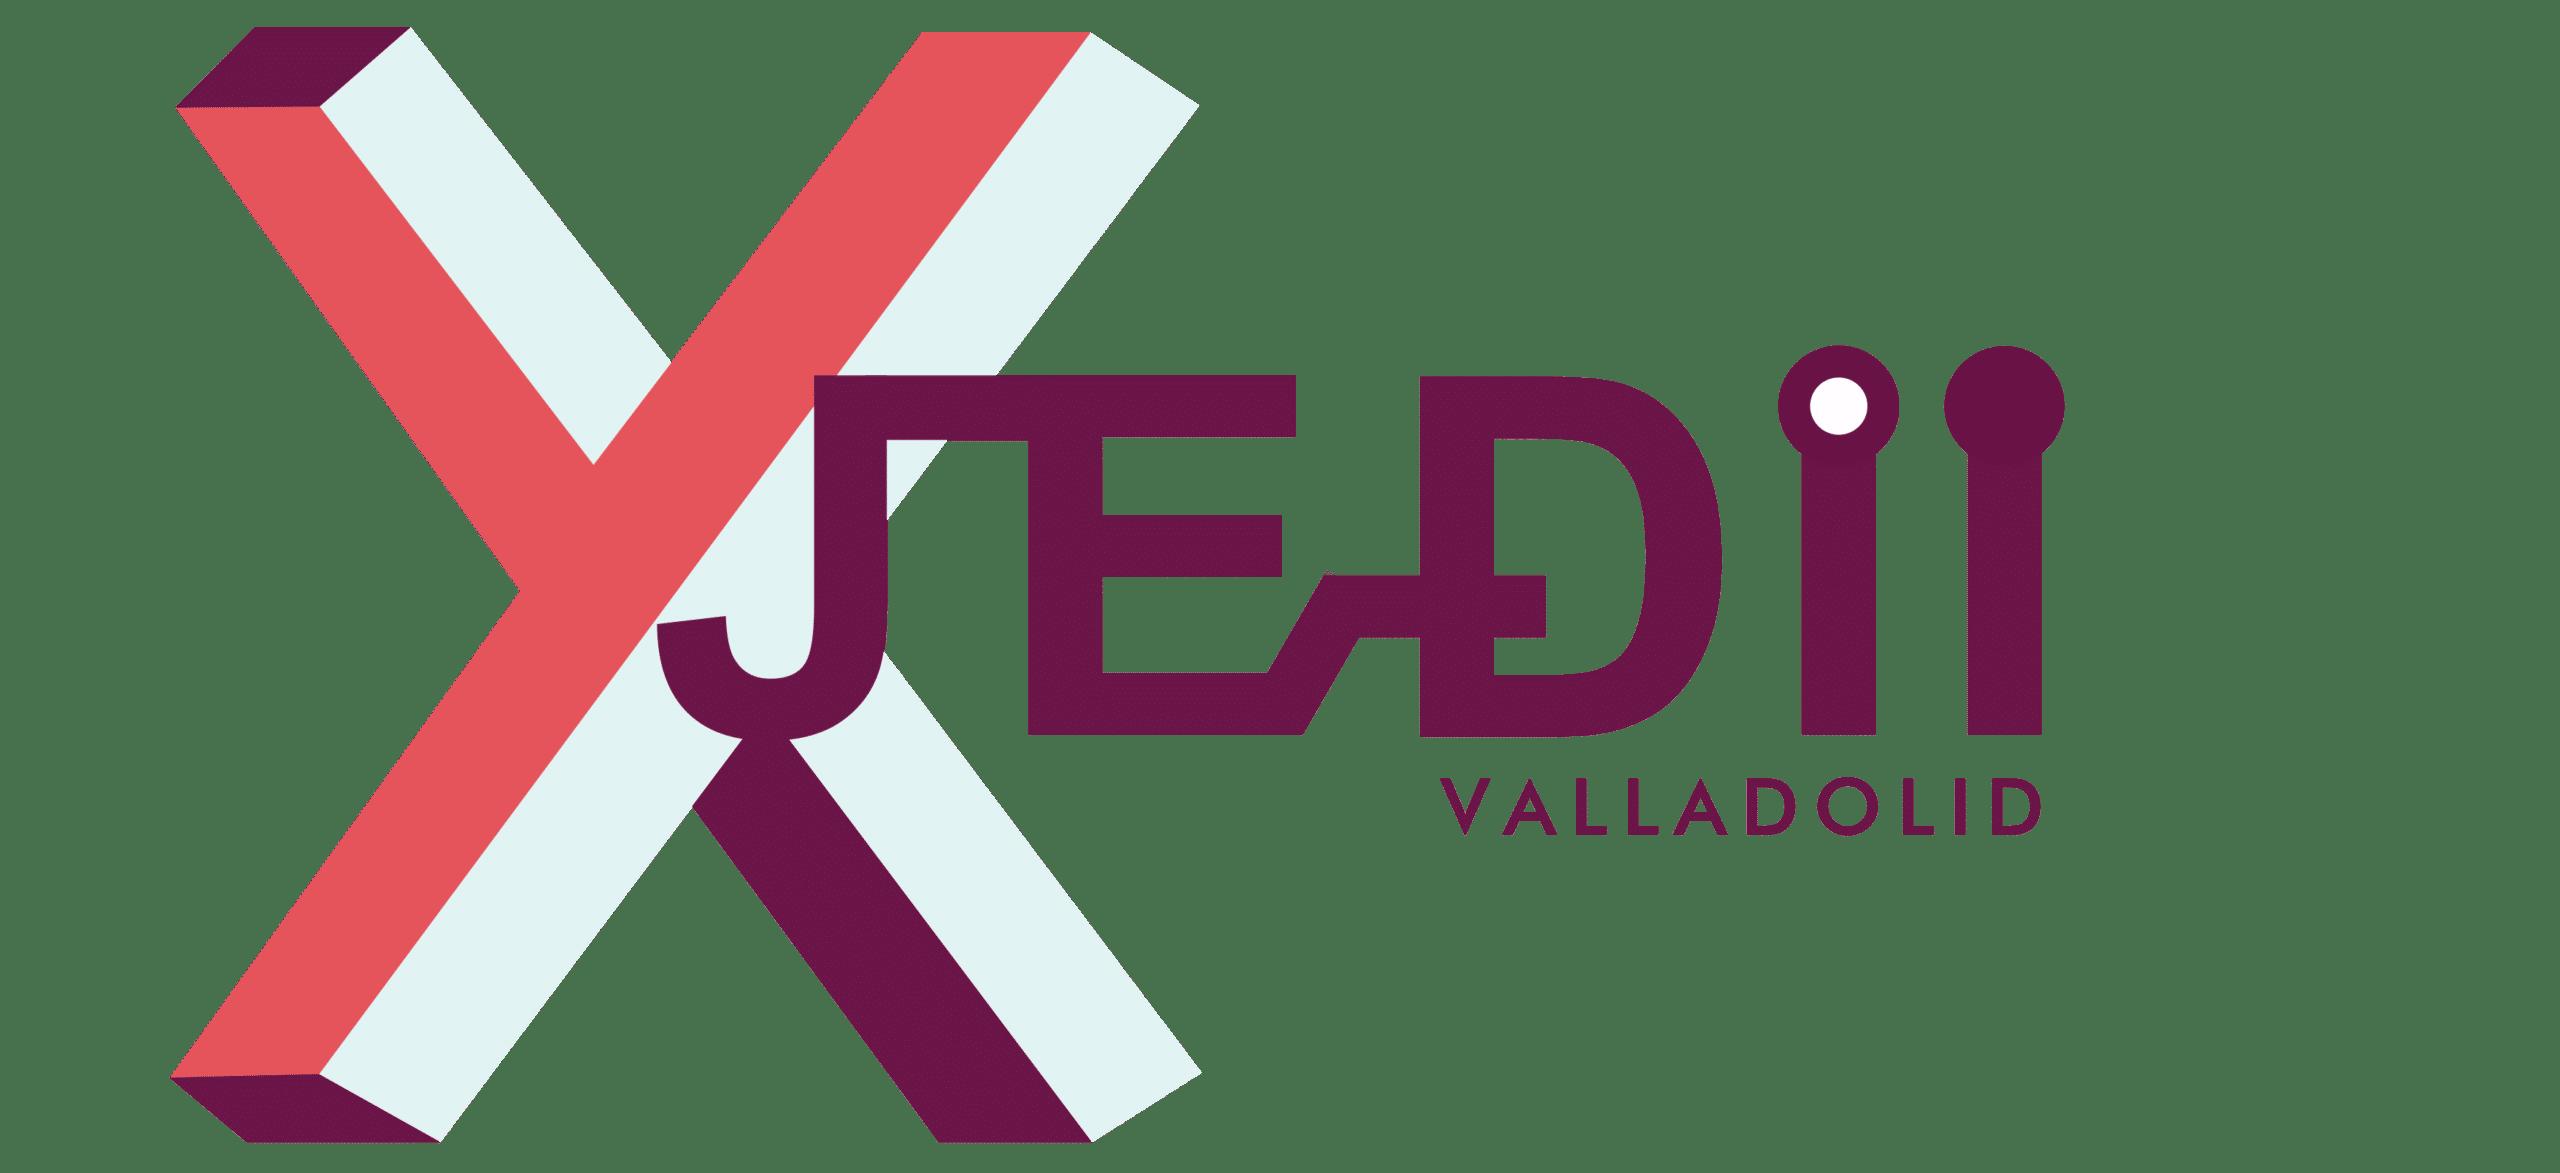 X JEDII Valladolid